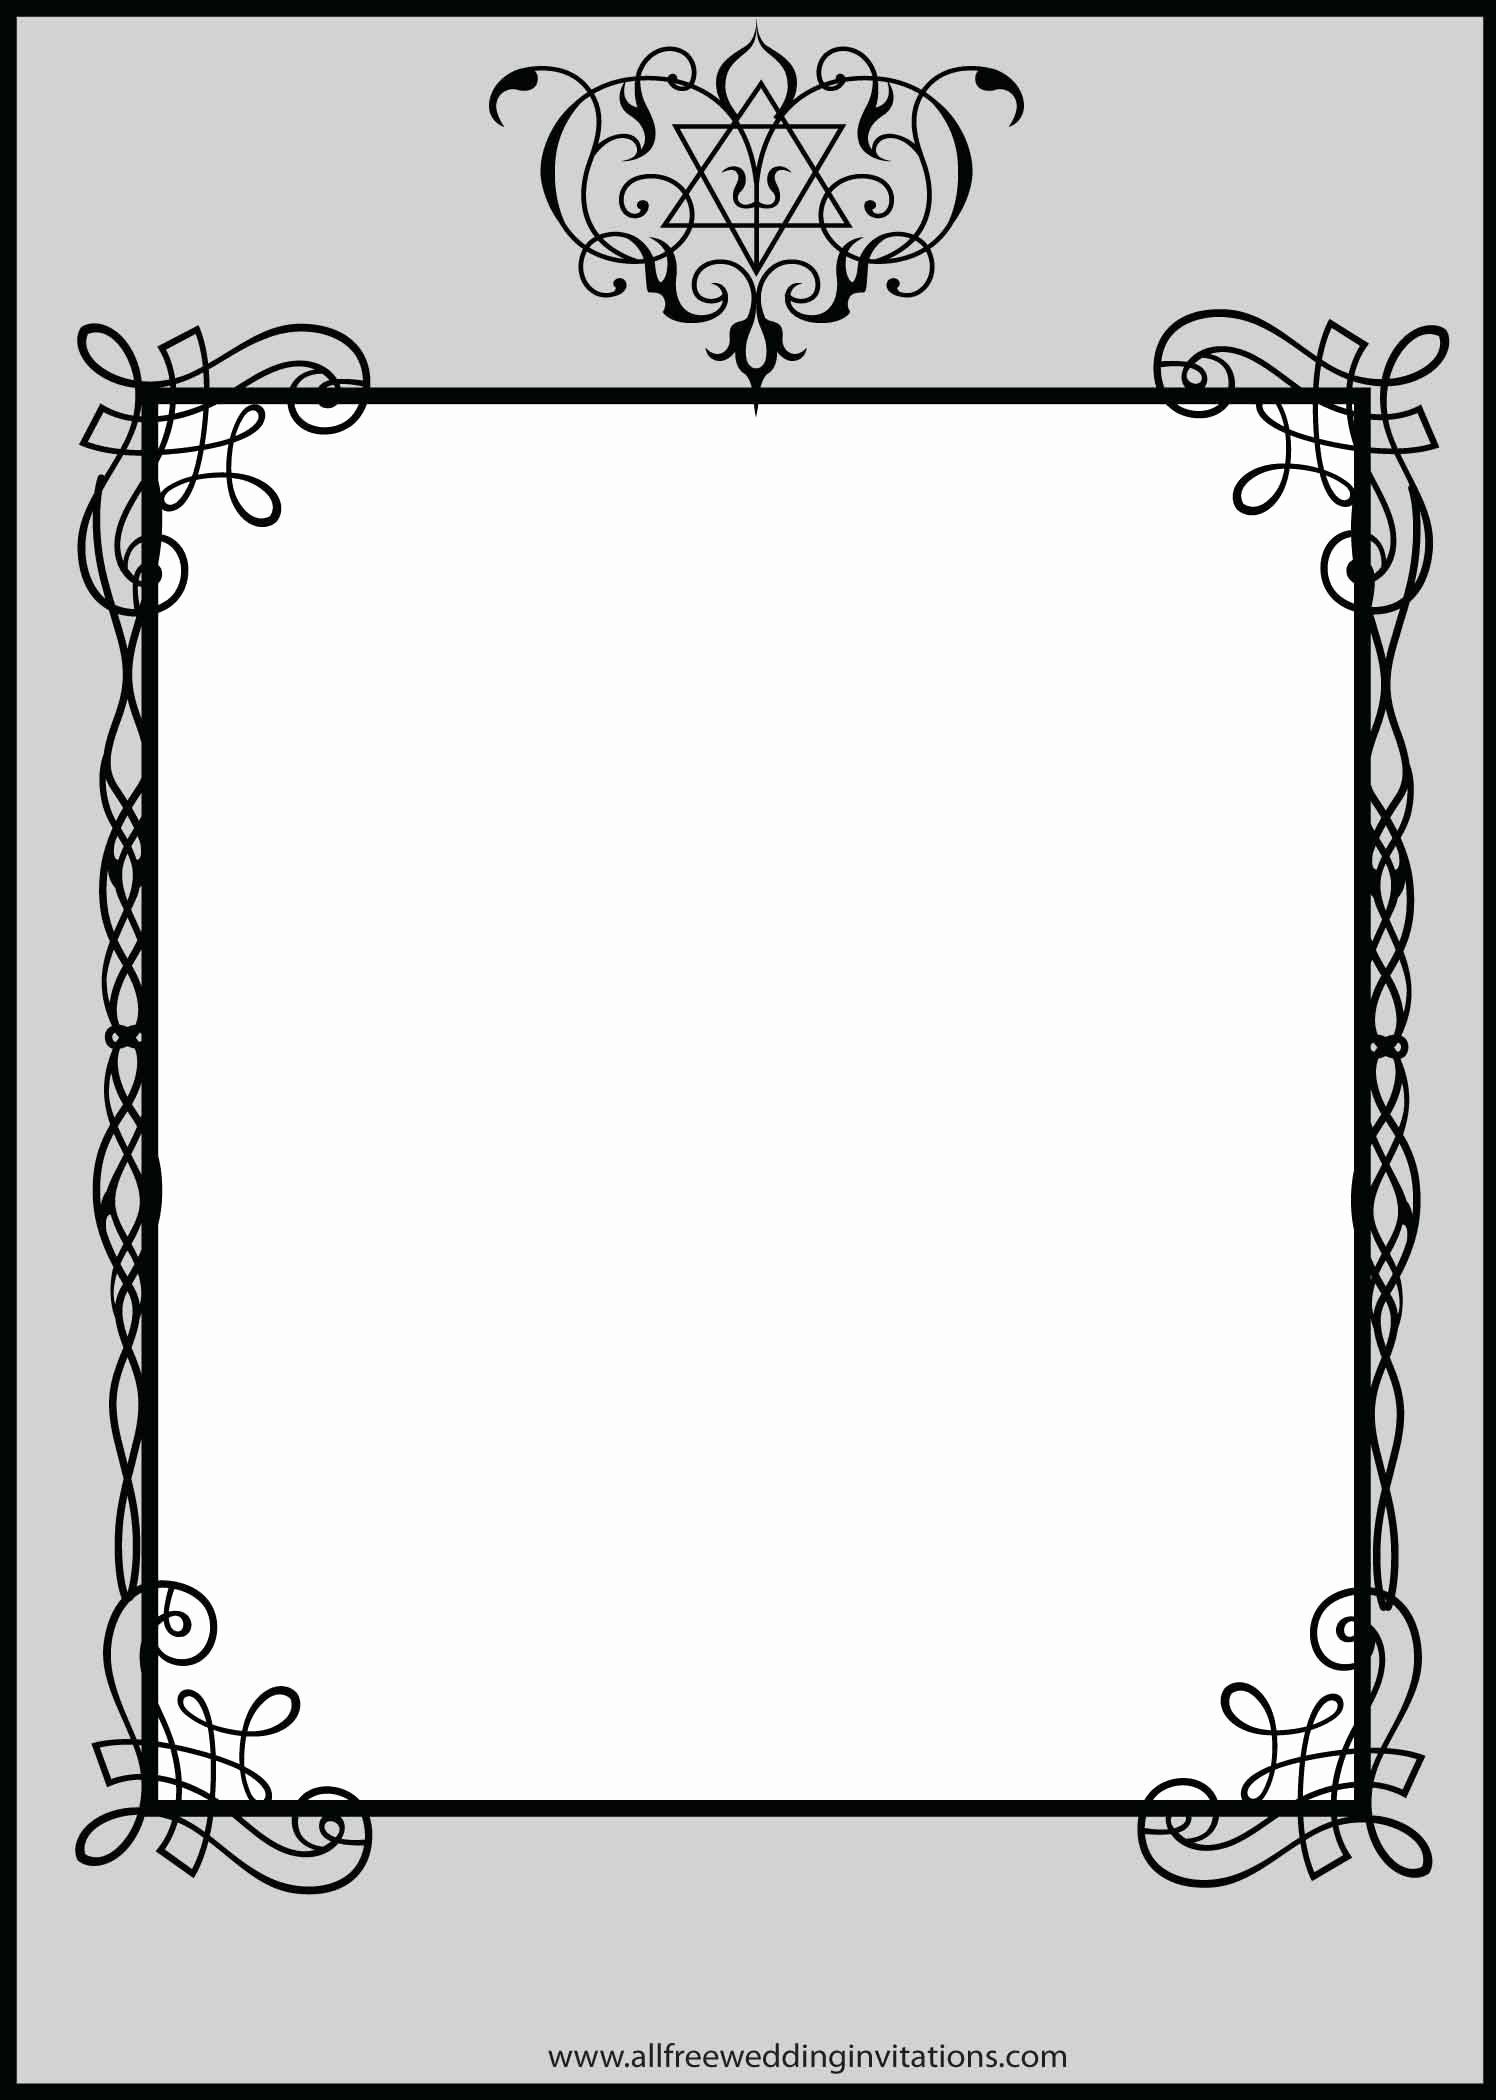 Blank formal Invitation Template